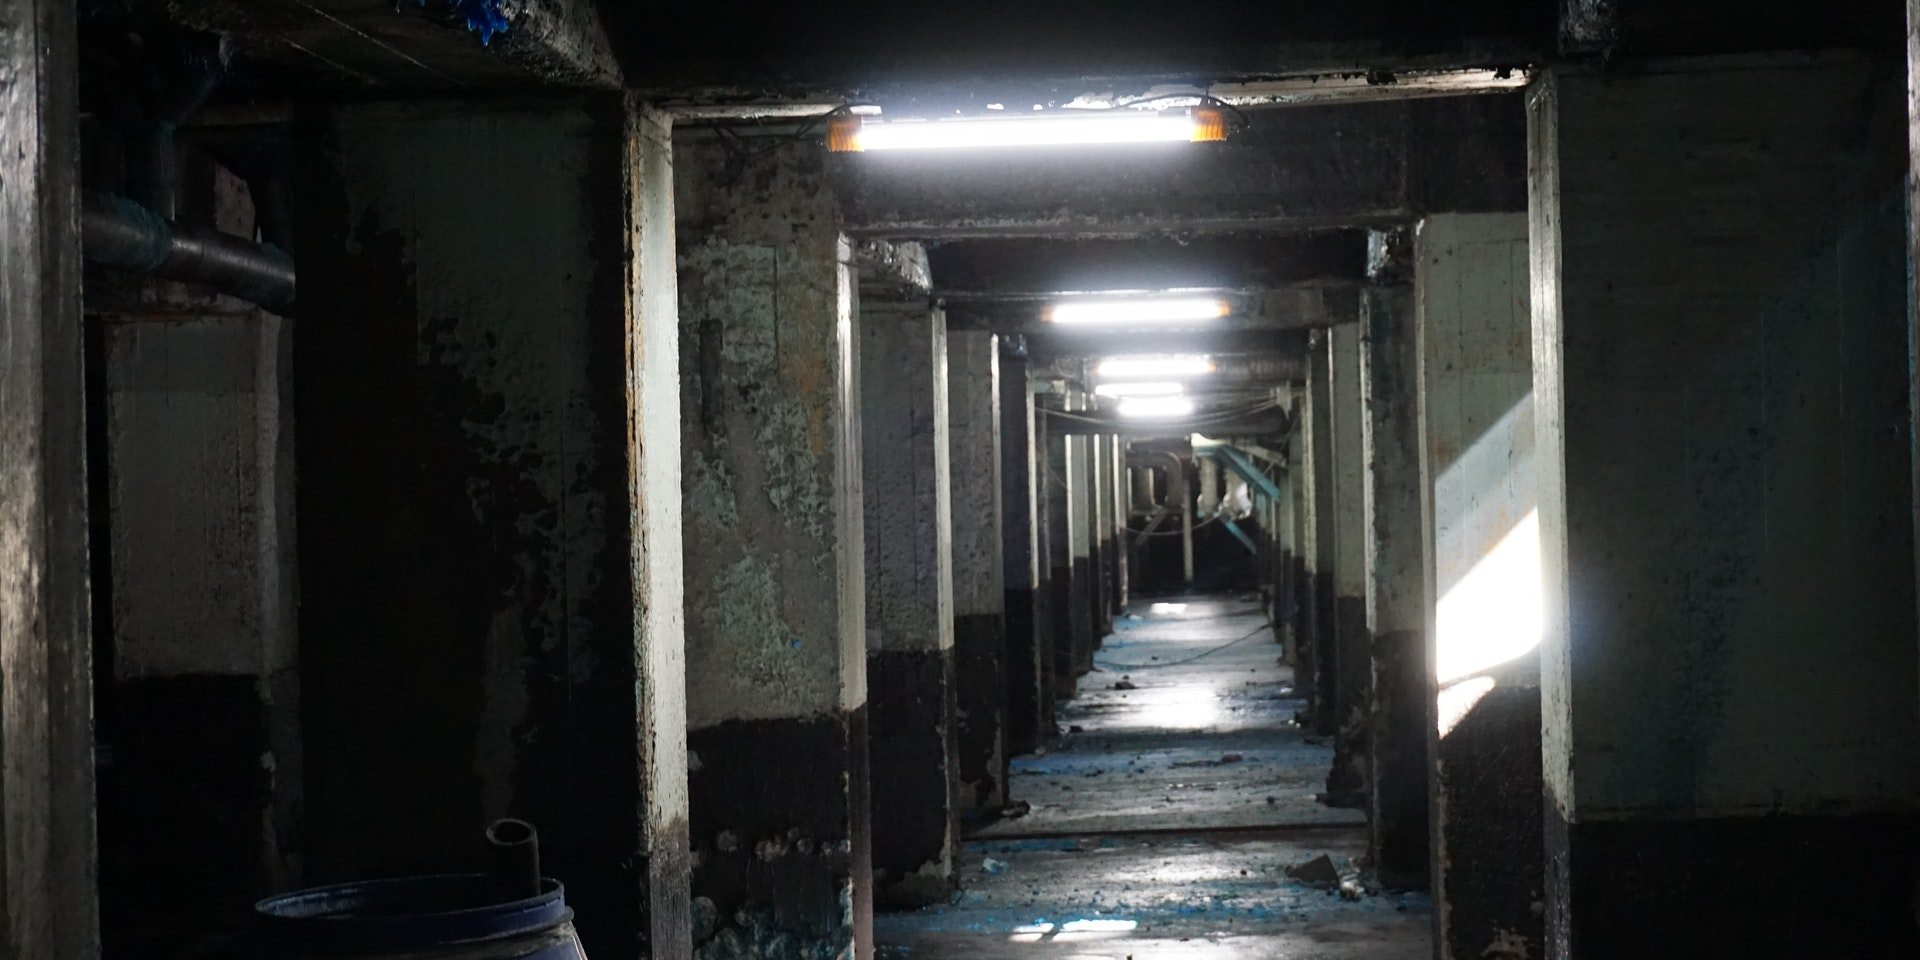 AC2 Mining Lead Light in application, installed in an underground mine long dark corridor